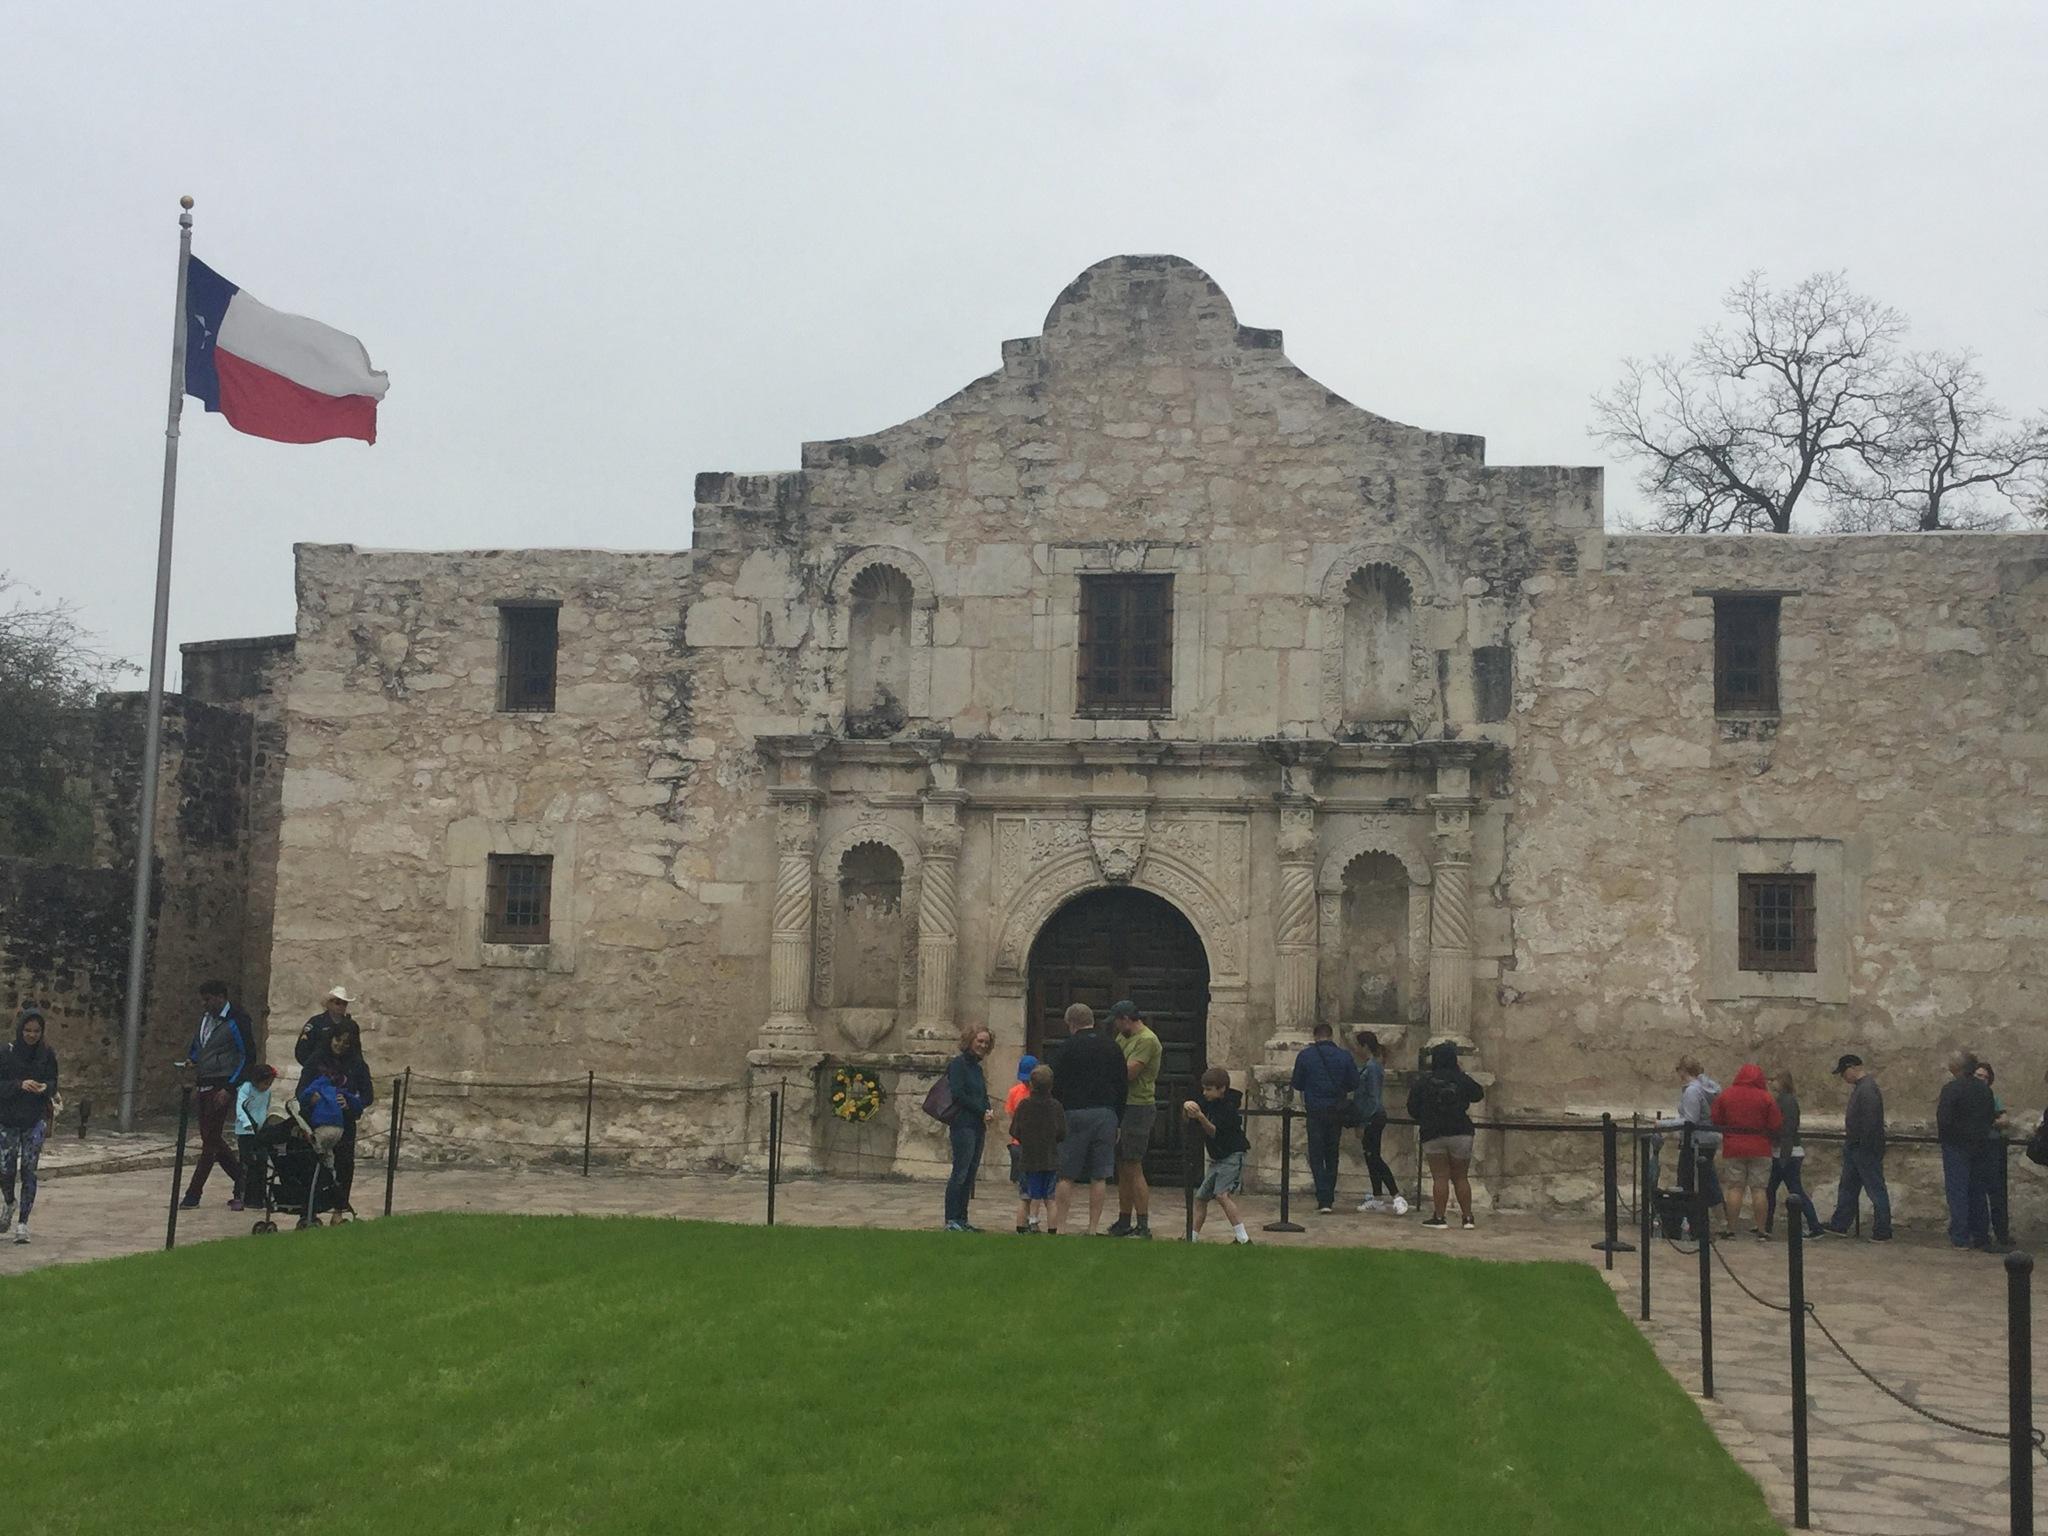 The Alamo San Antonio Texas  by Bertha Aguero